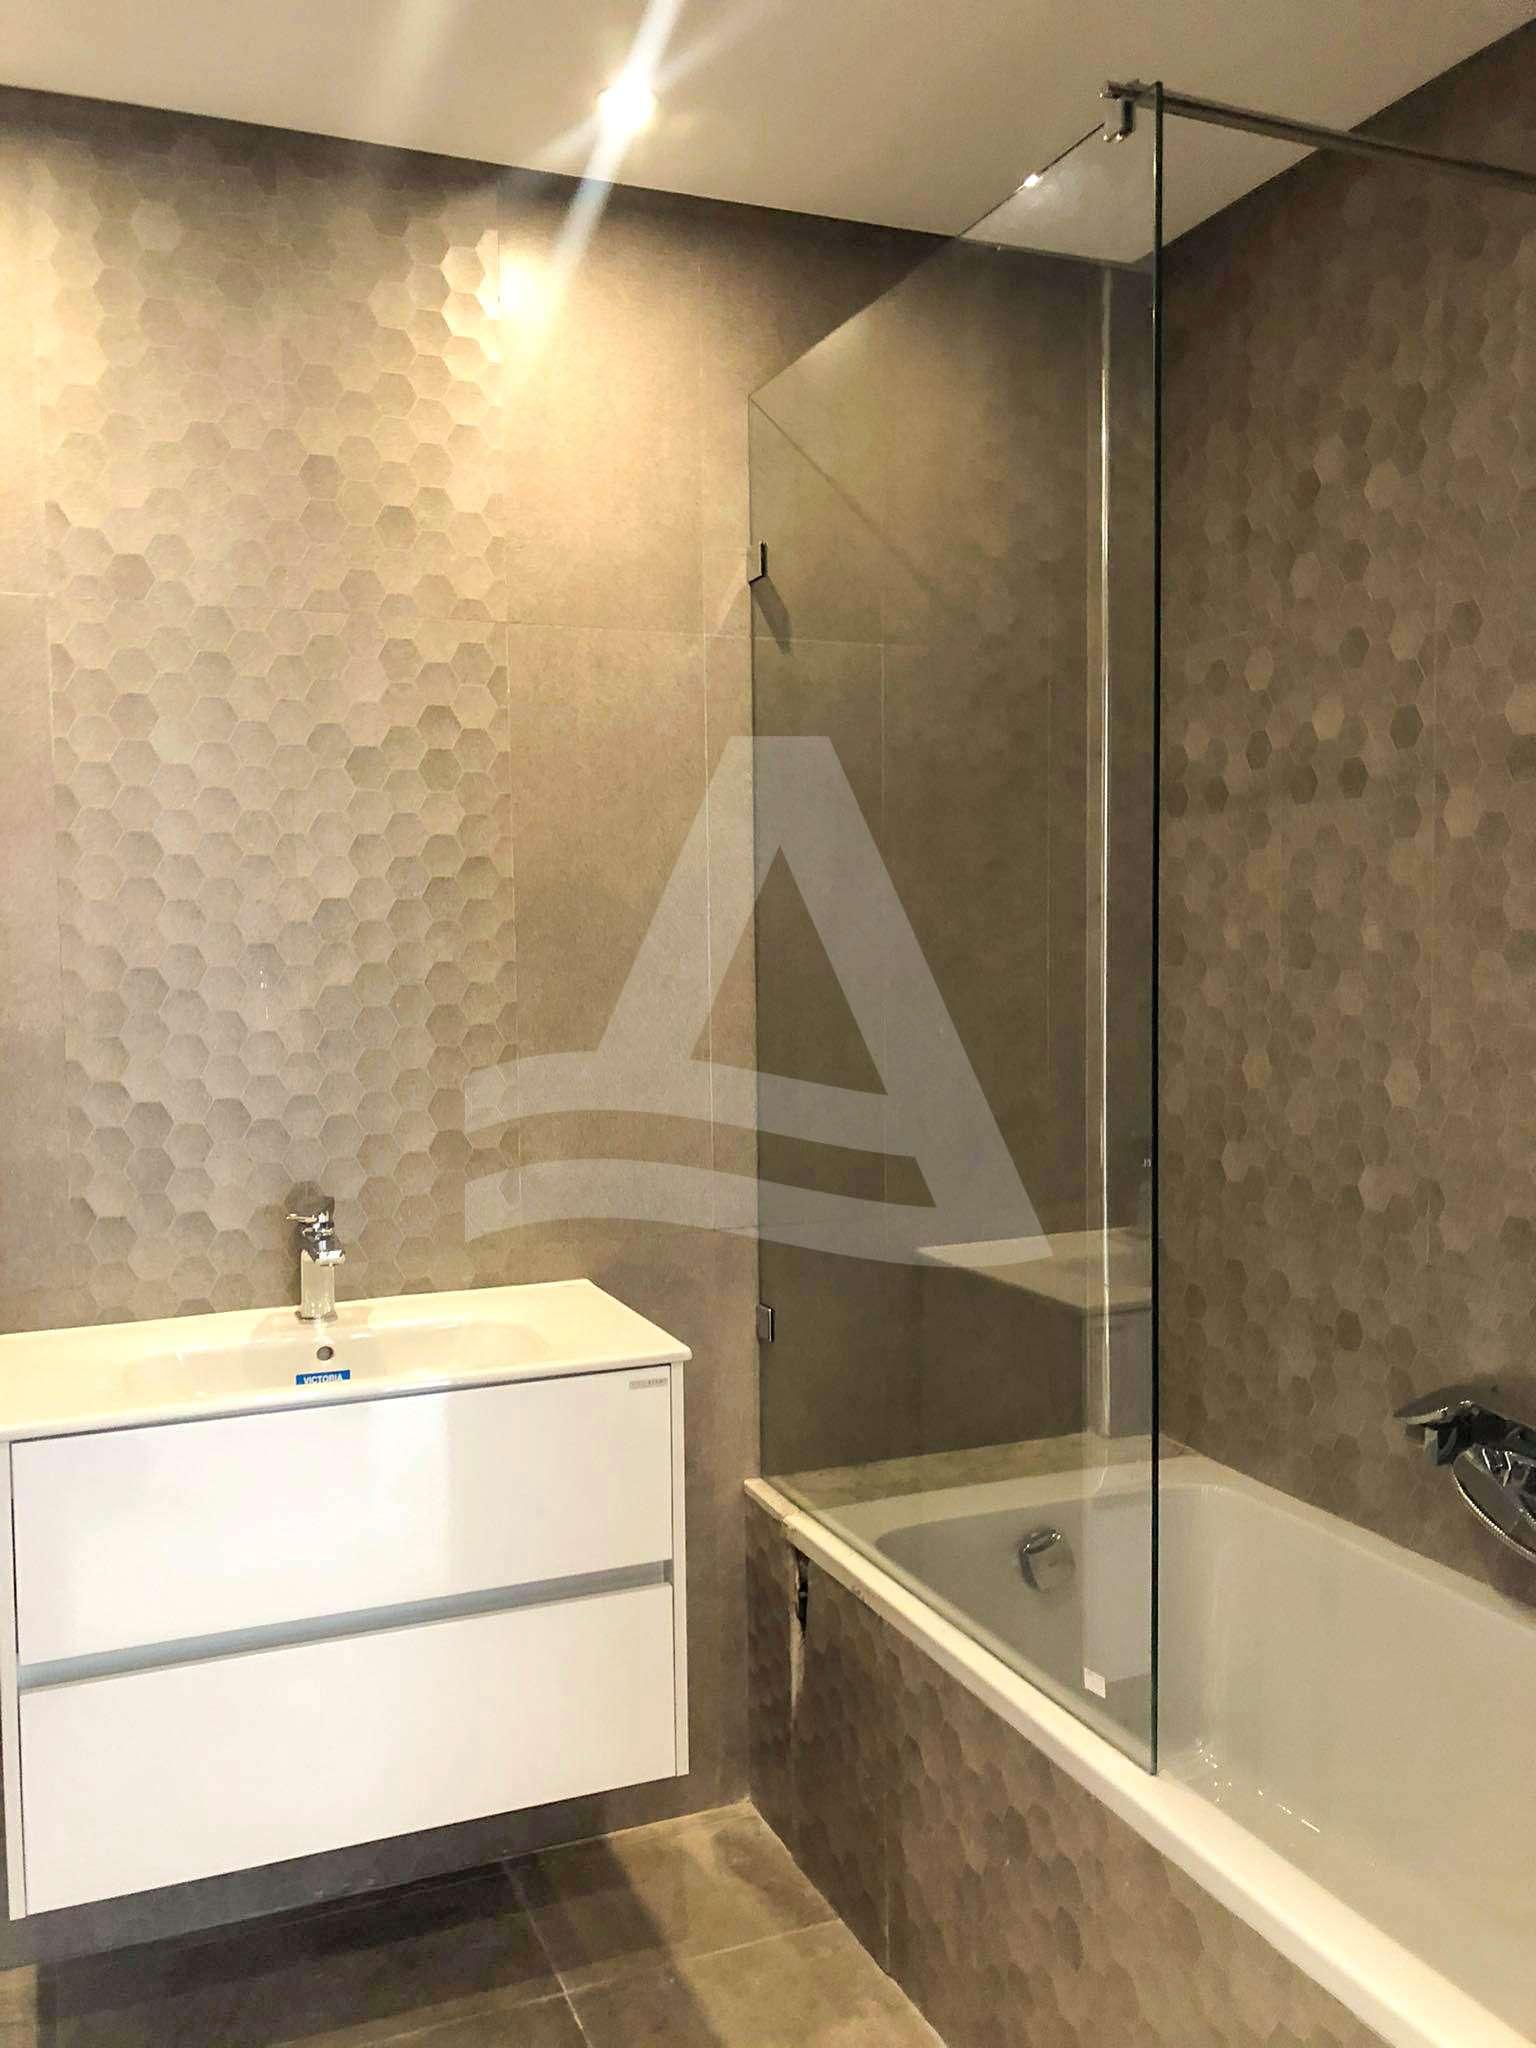 httpss3.amazonaws.comlogimoaws13573650601622886925appartement_vue_mer_9_sur_15